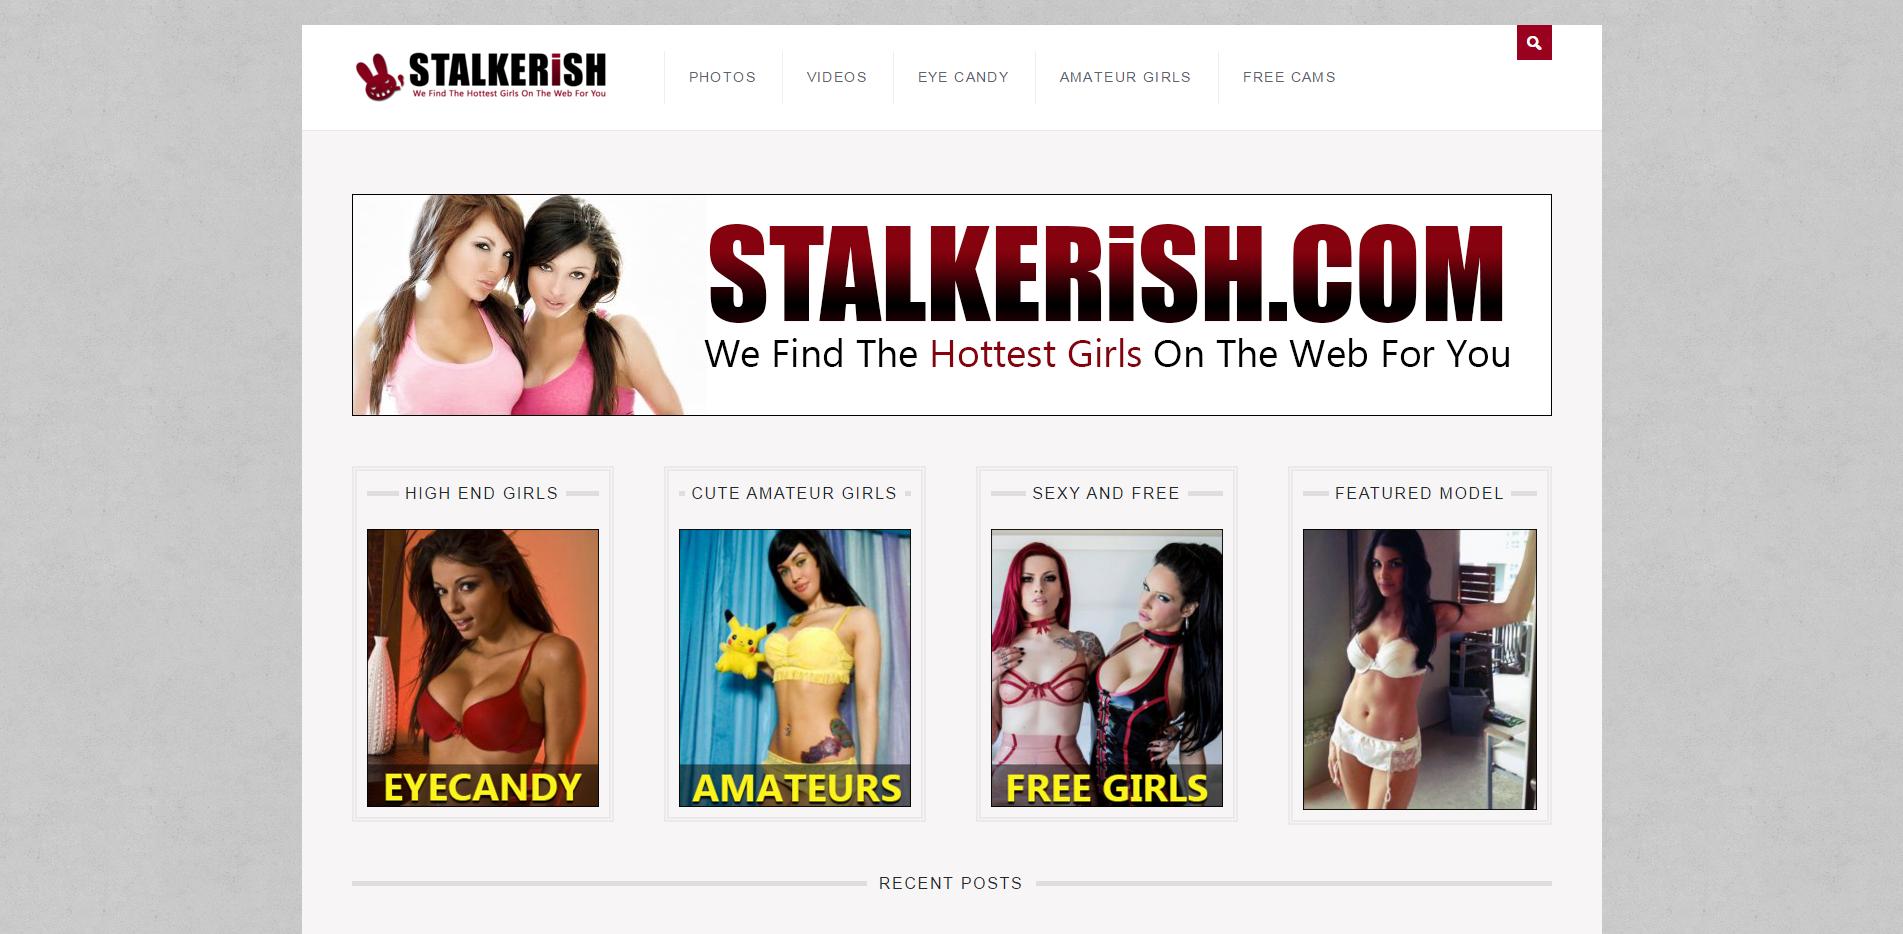 Stalkerish.com